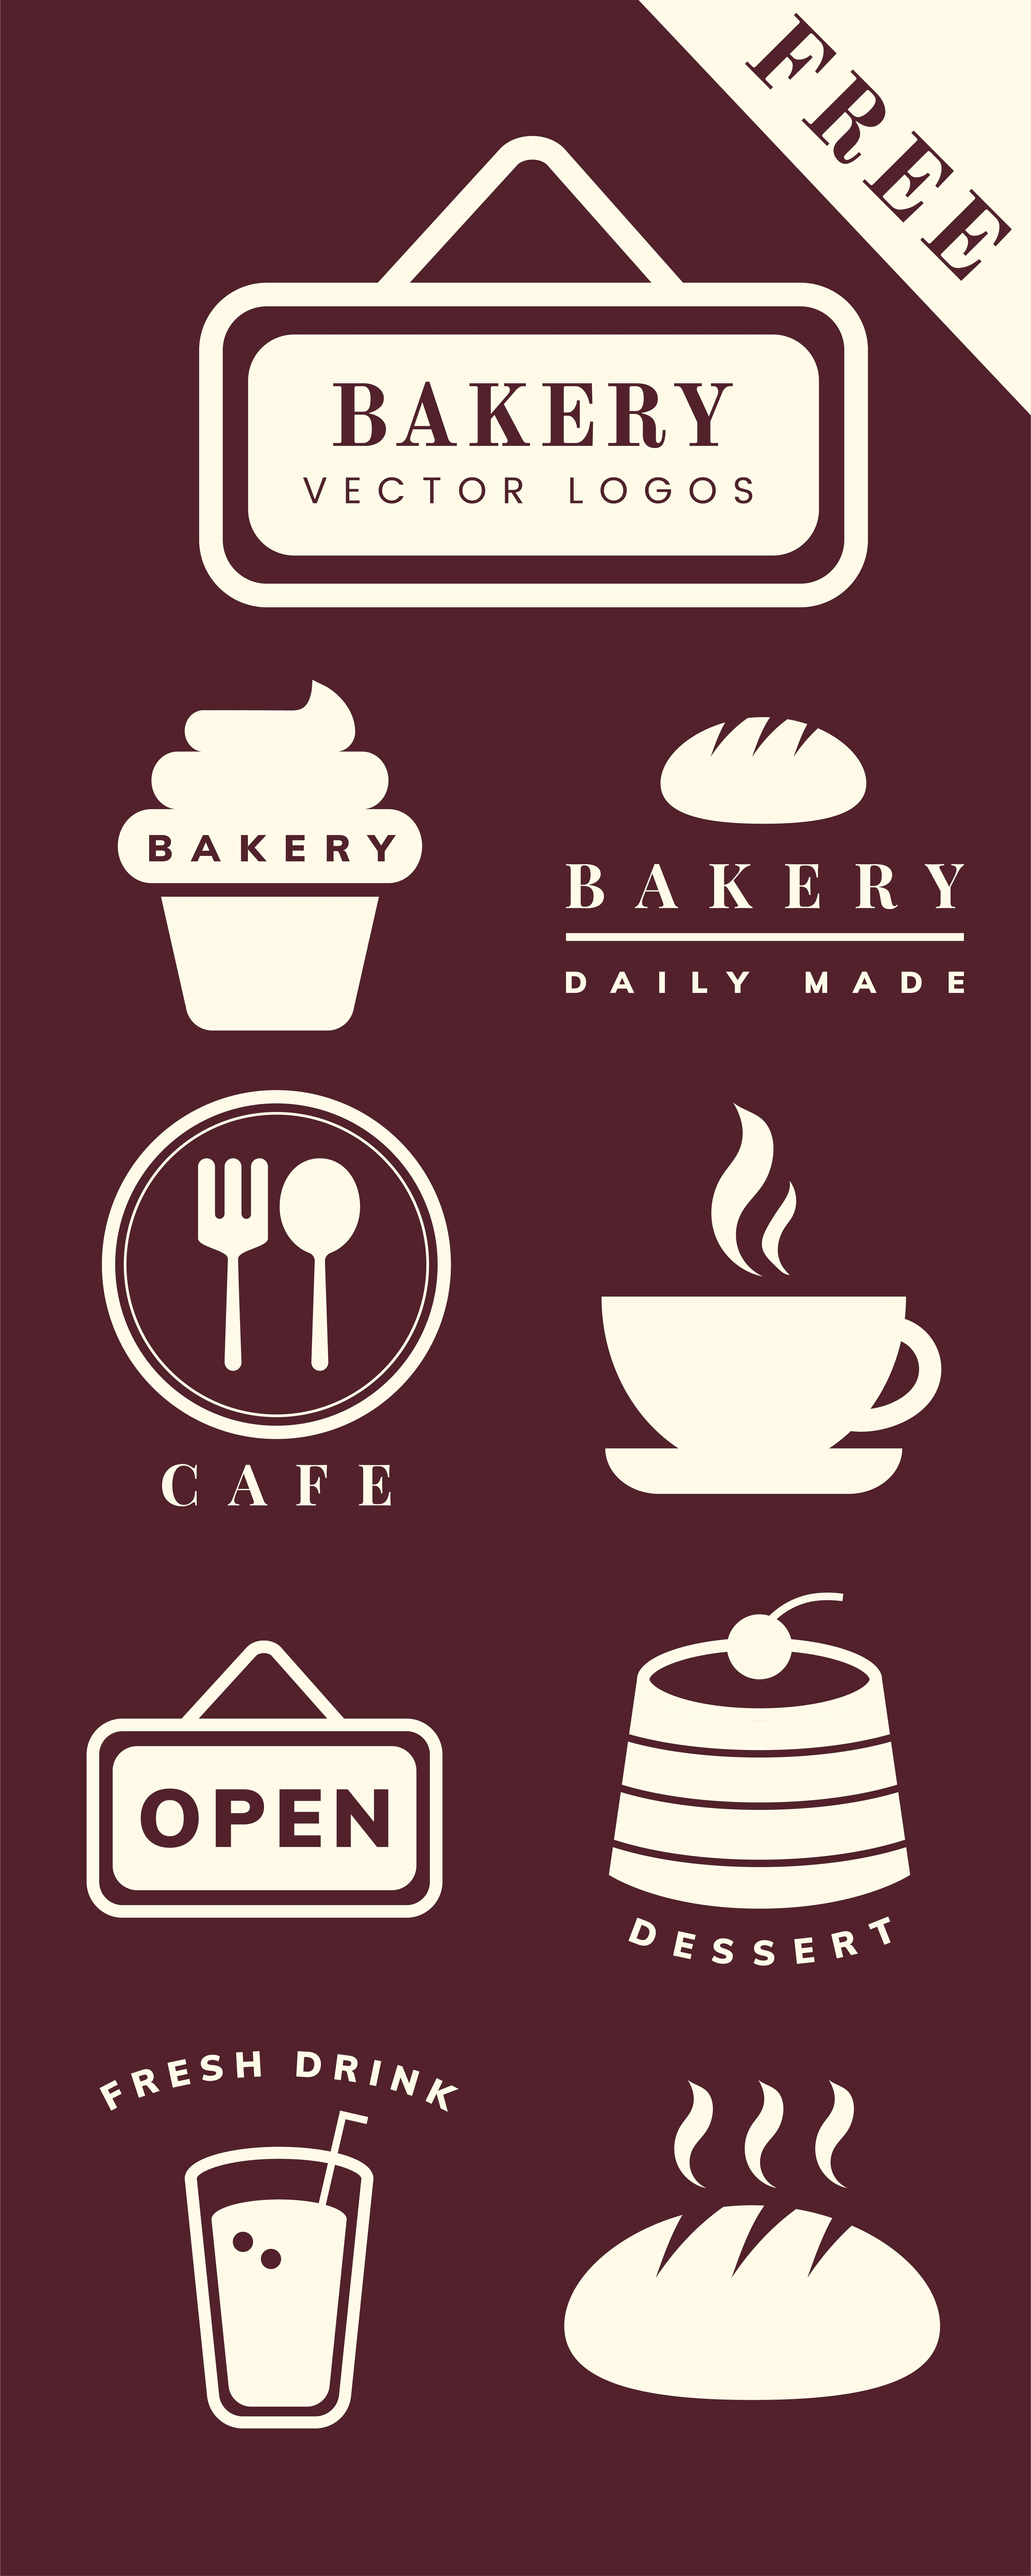 Download free and premium royaltyfree vectors of bakery